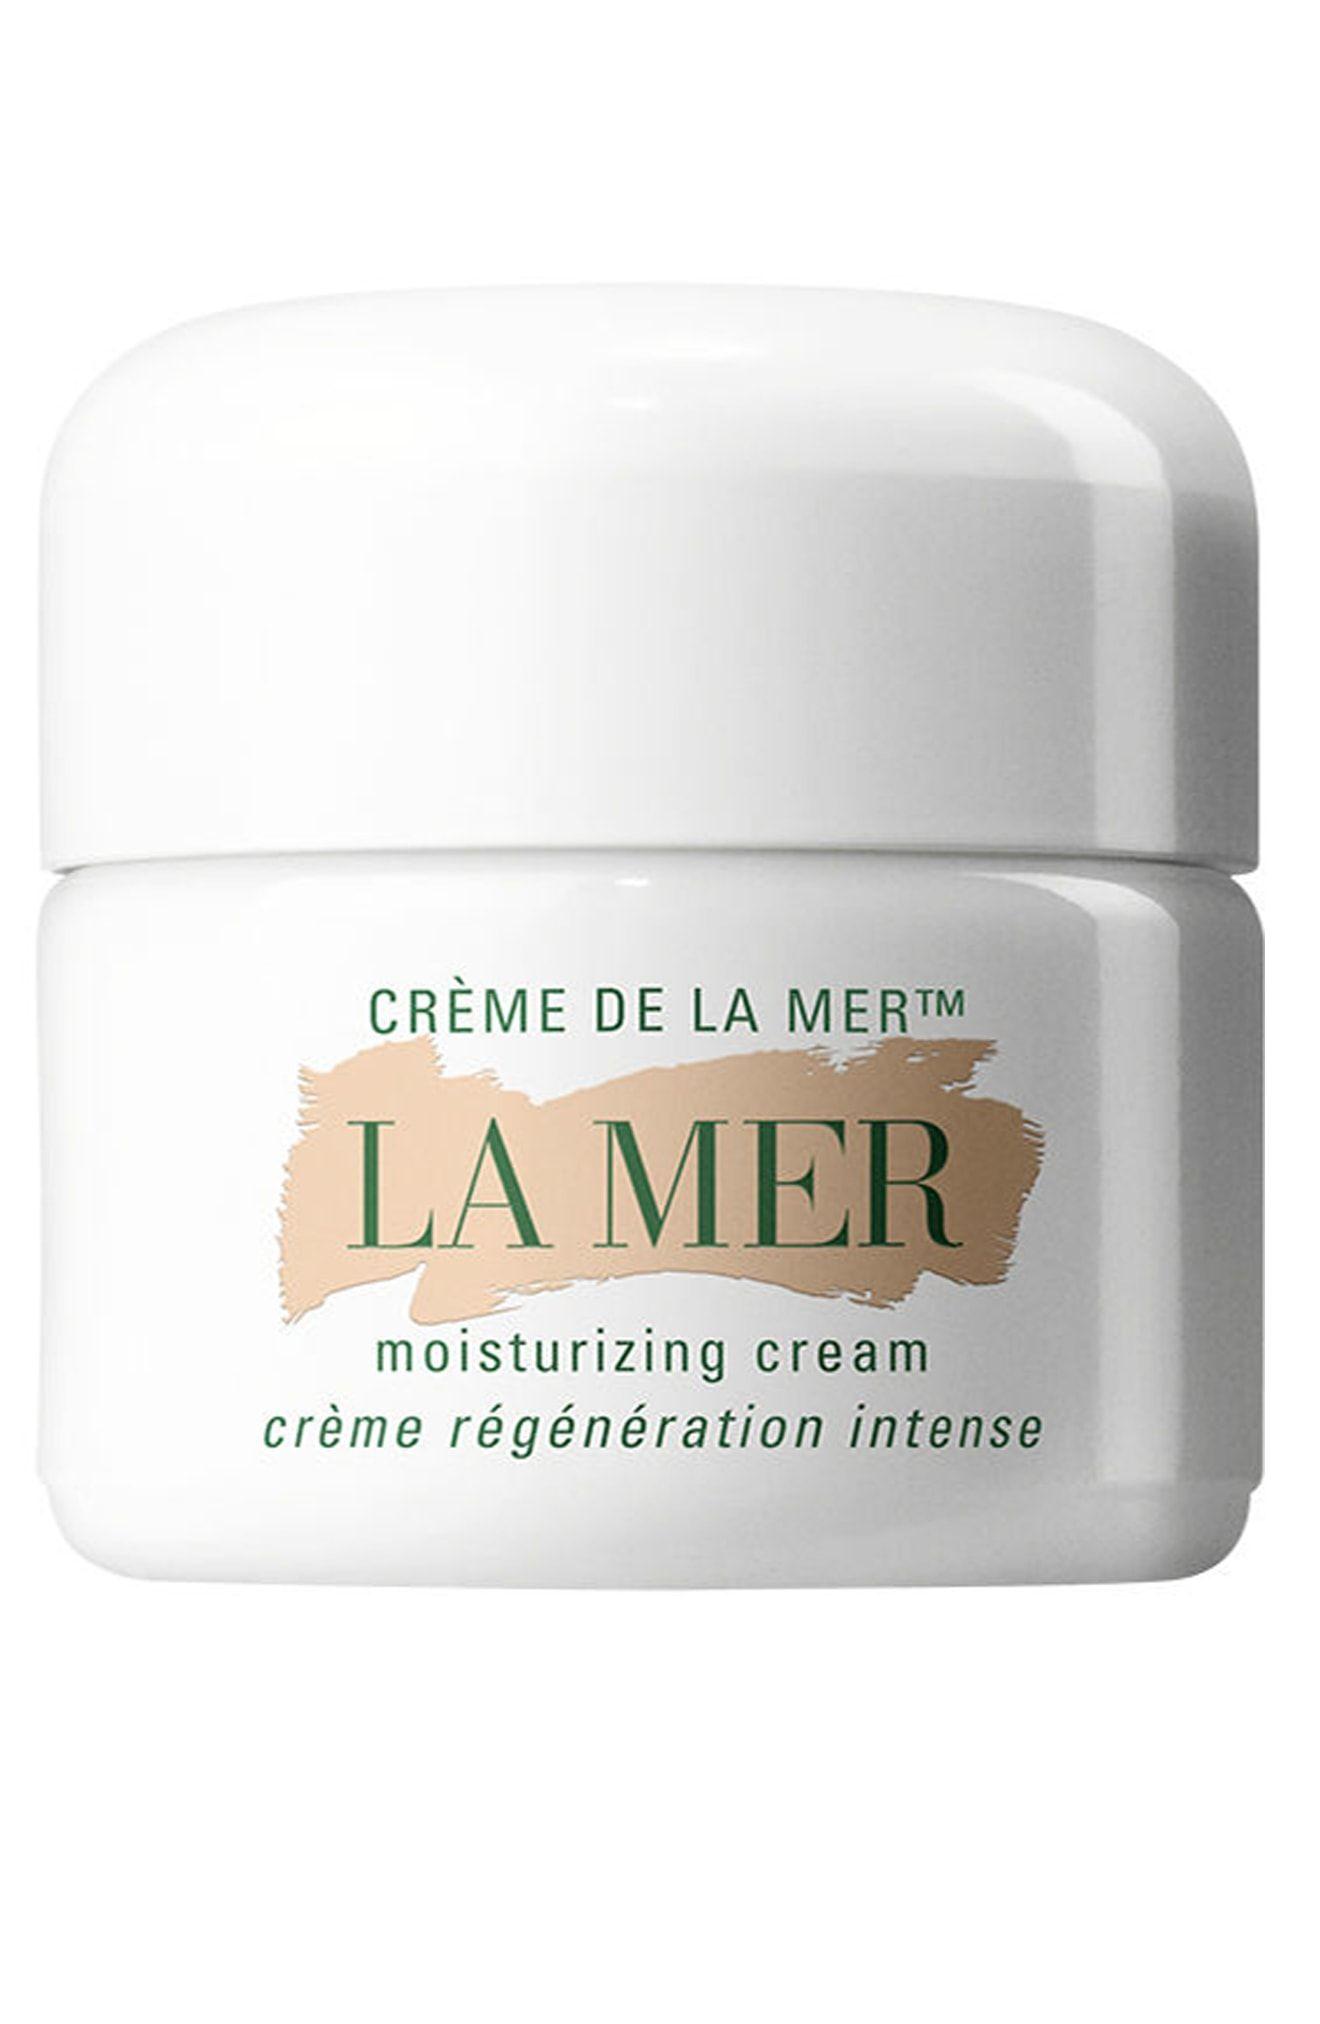 Creme De La Mer Moisturizing Cream La Mer Moisturizing Cream